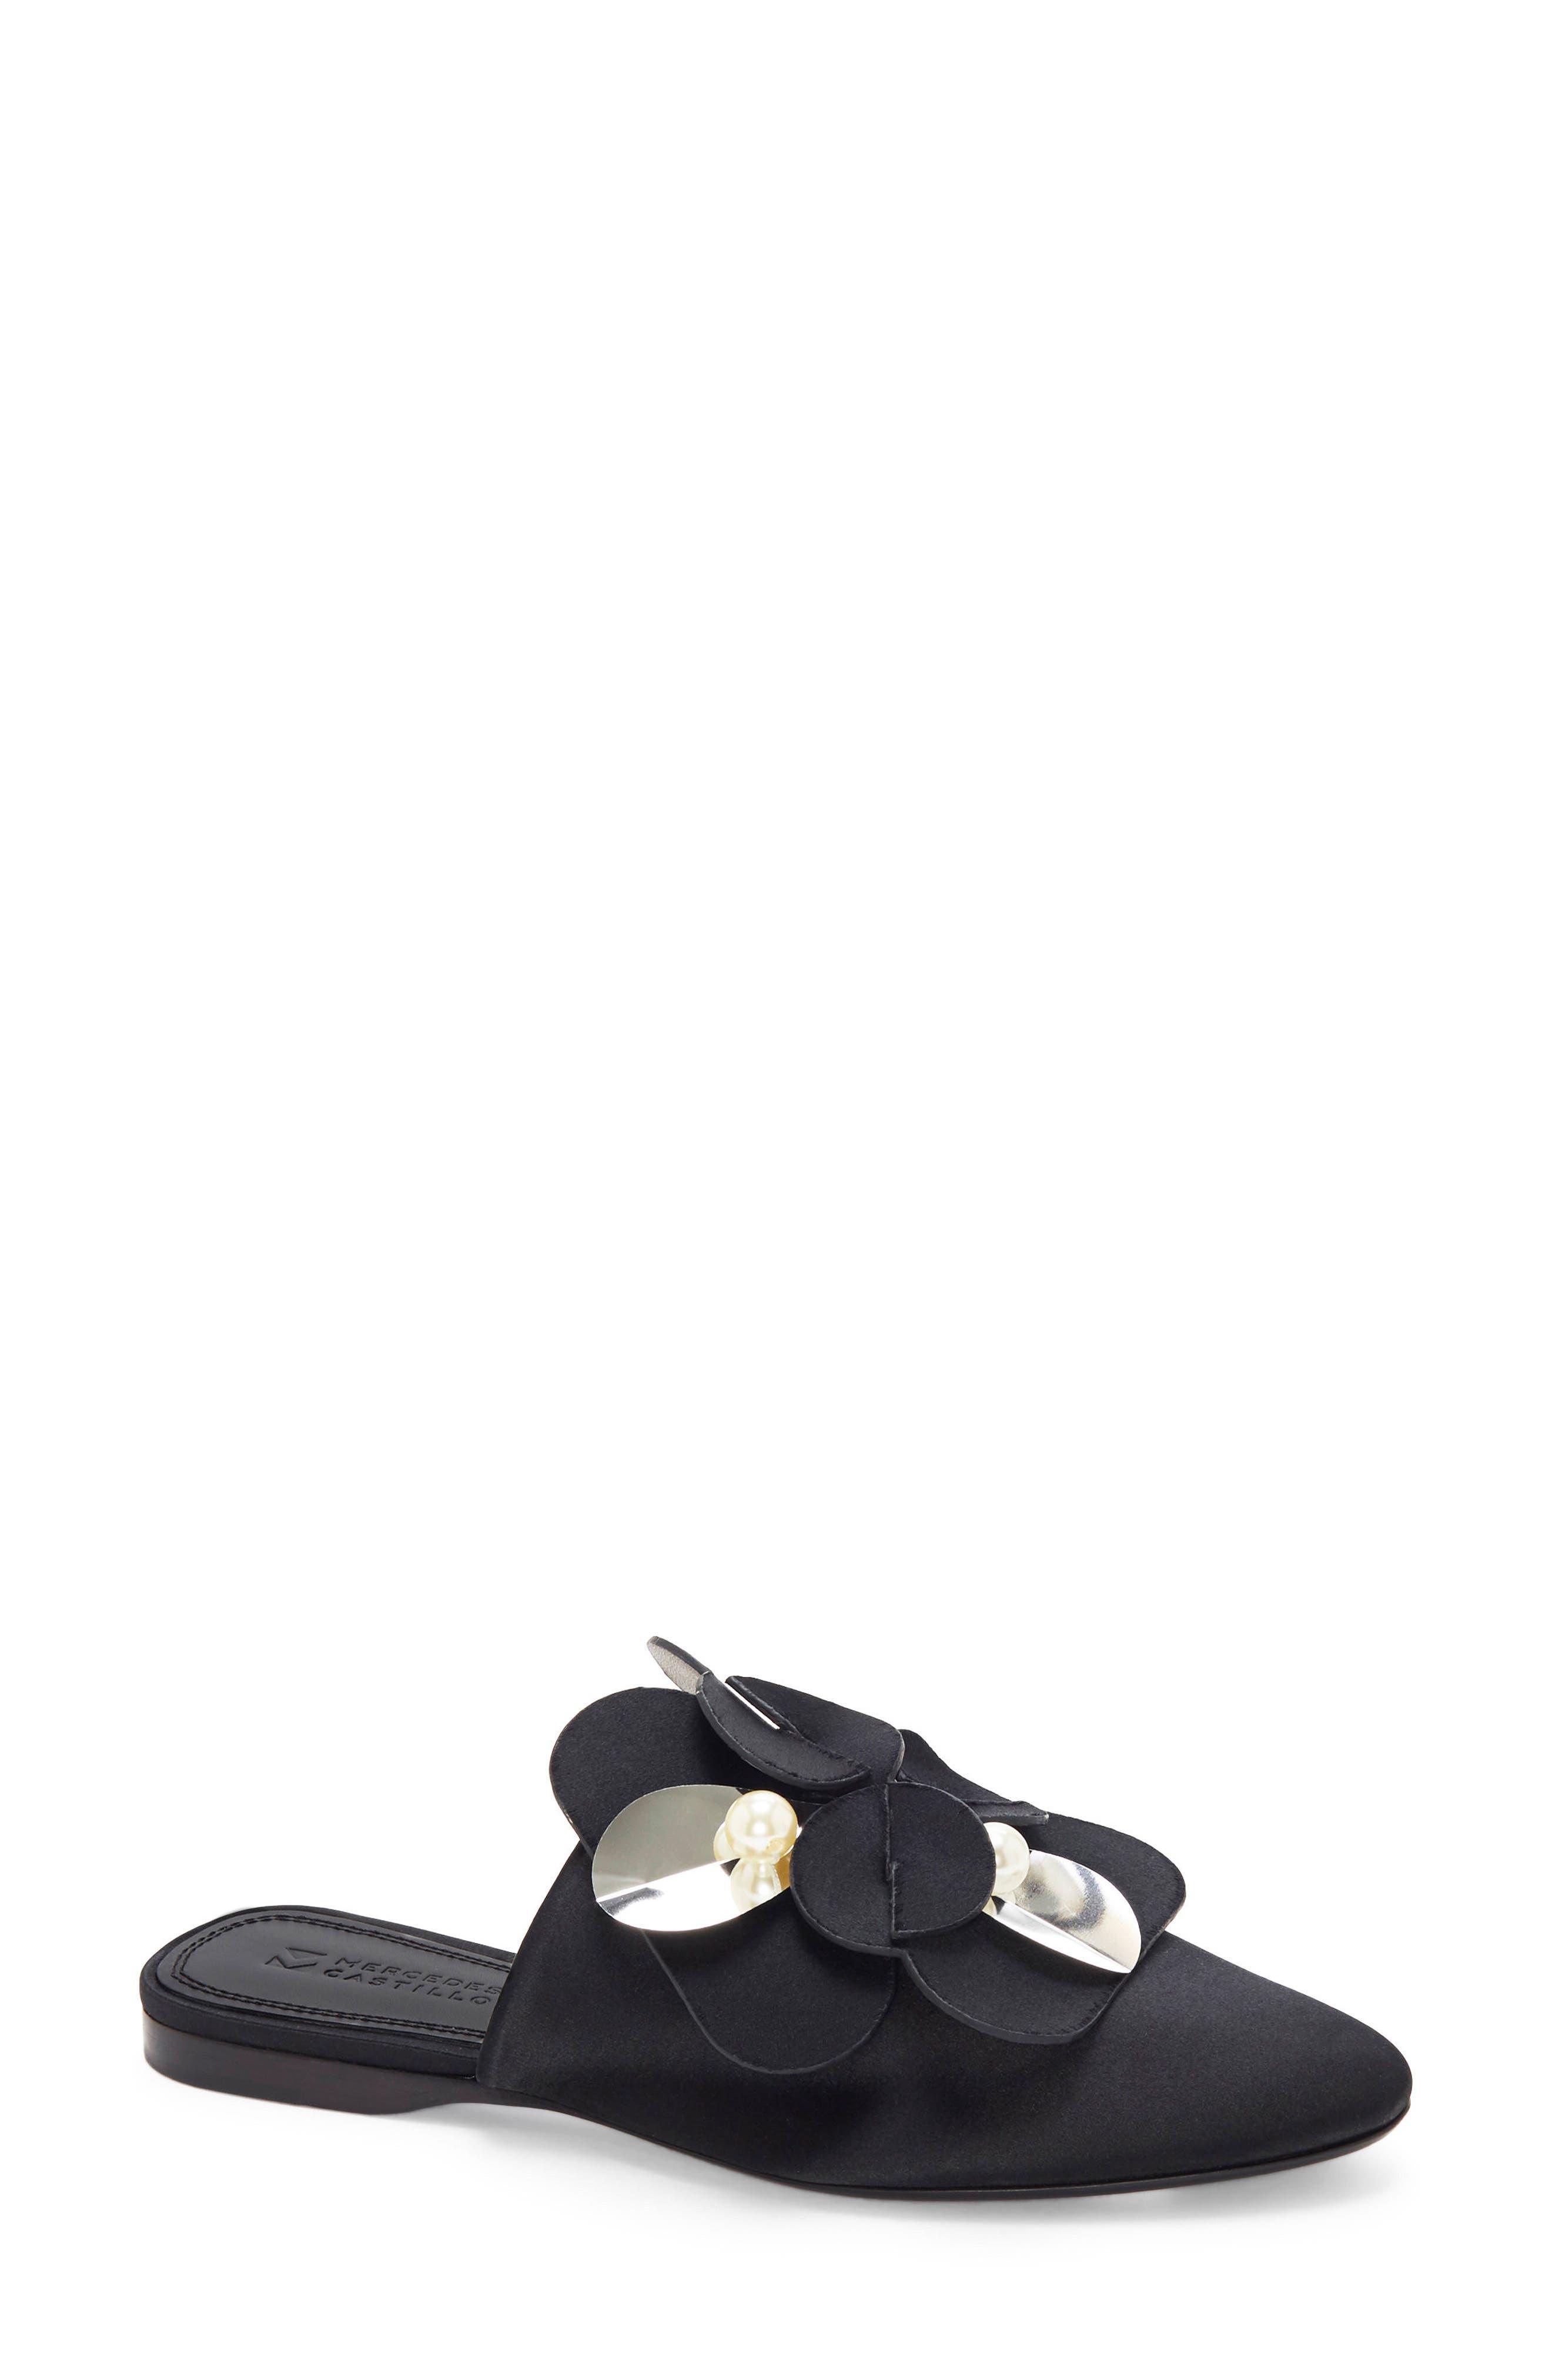 Corella Embellished Slide Sandal,                             Main thumbnail 1, color,                             Black